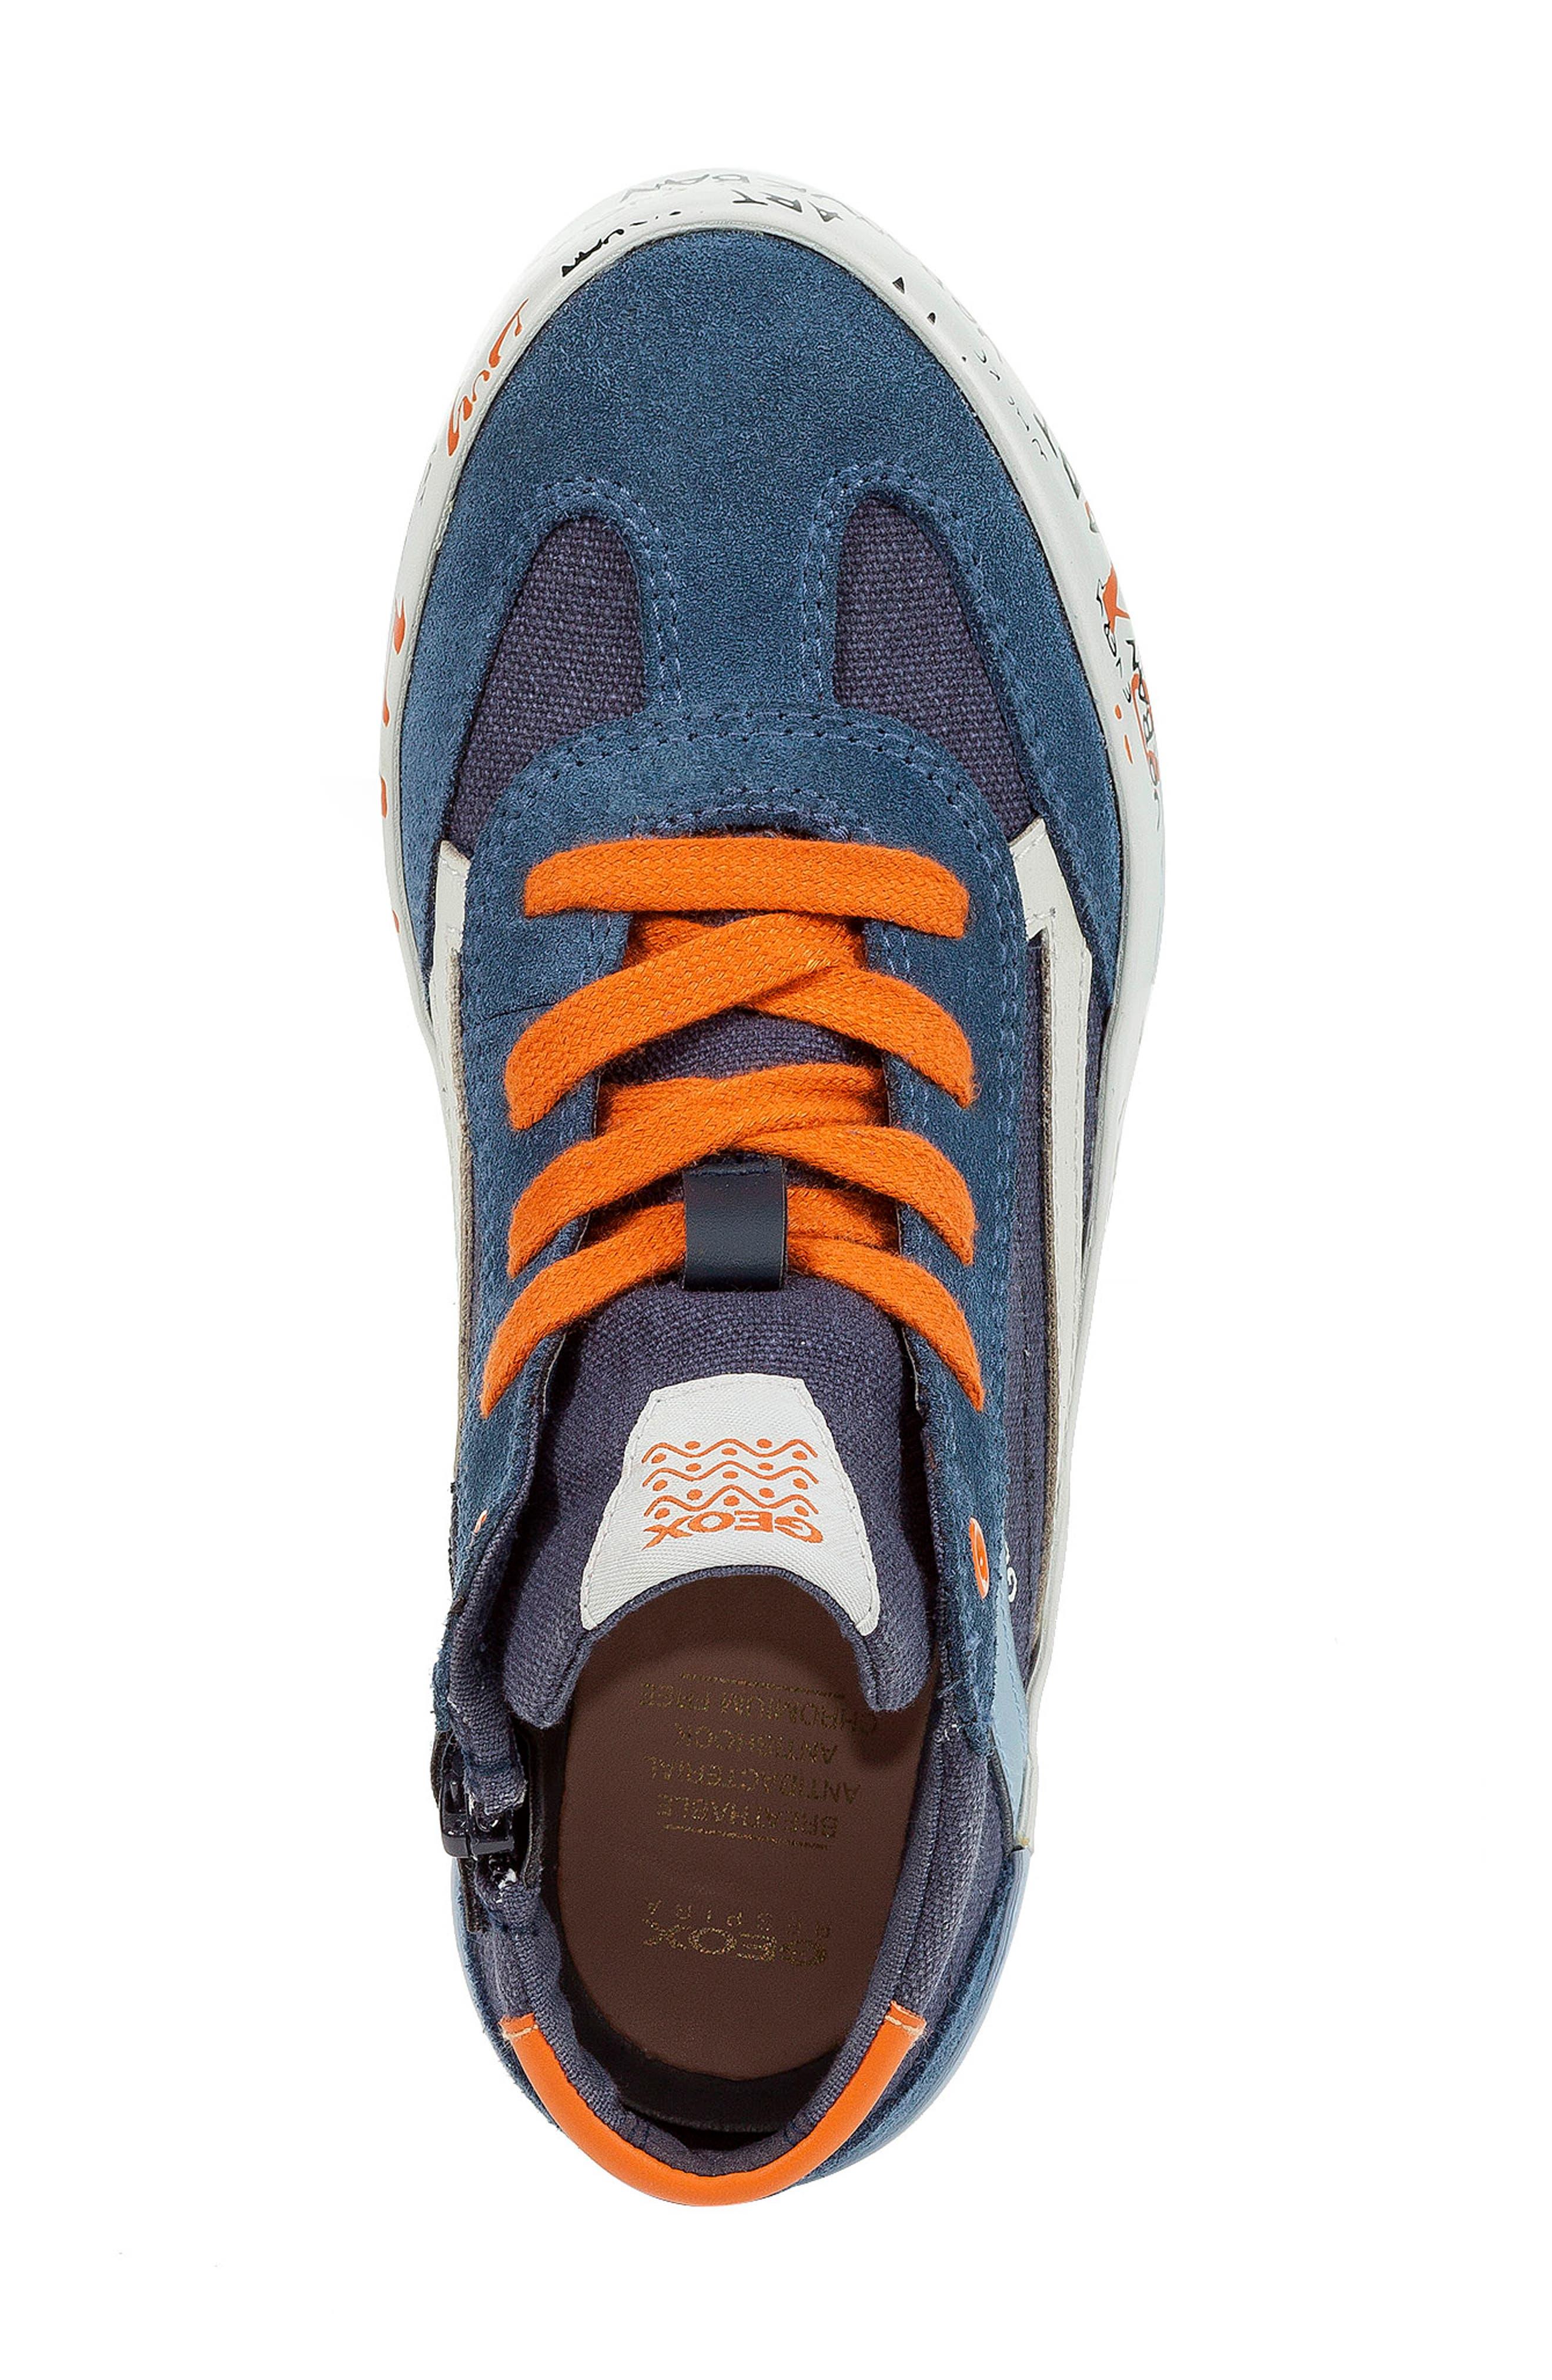 Alonisso 34 High Top Sneaker,                             Alternate thumbnail 5, color,                             NAVY/ DARK ORANGE